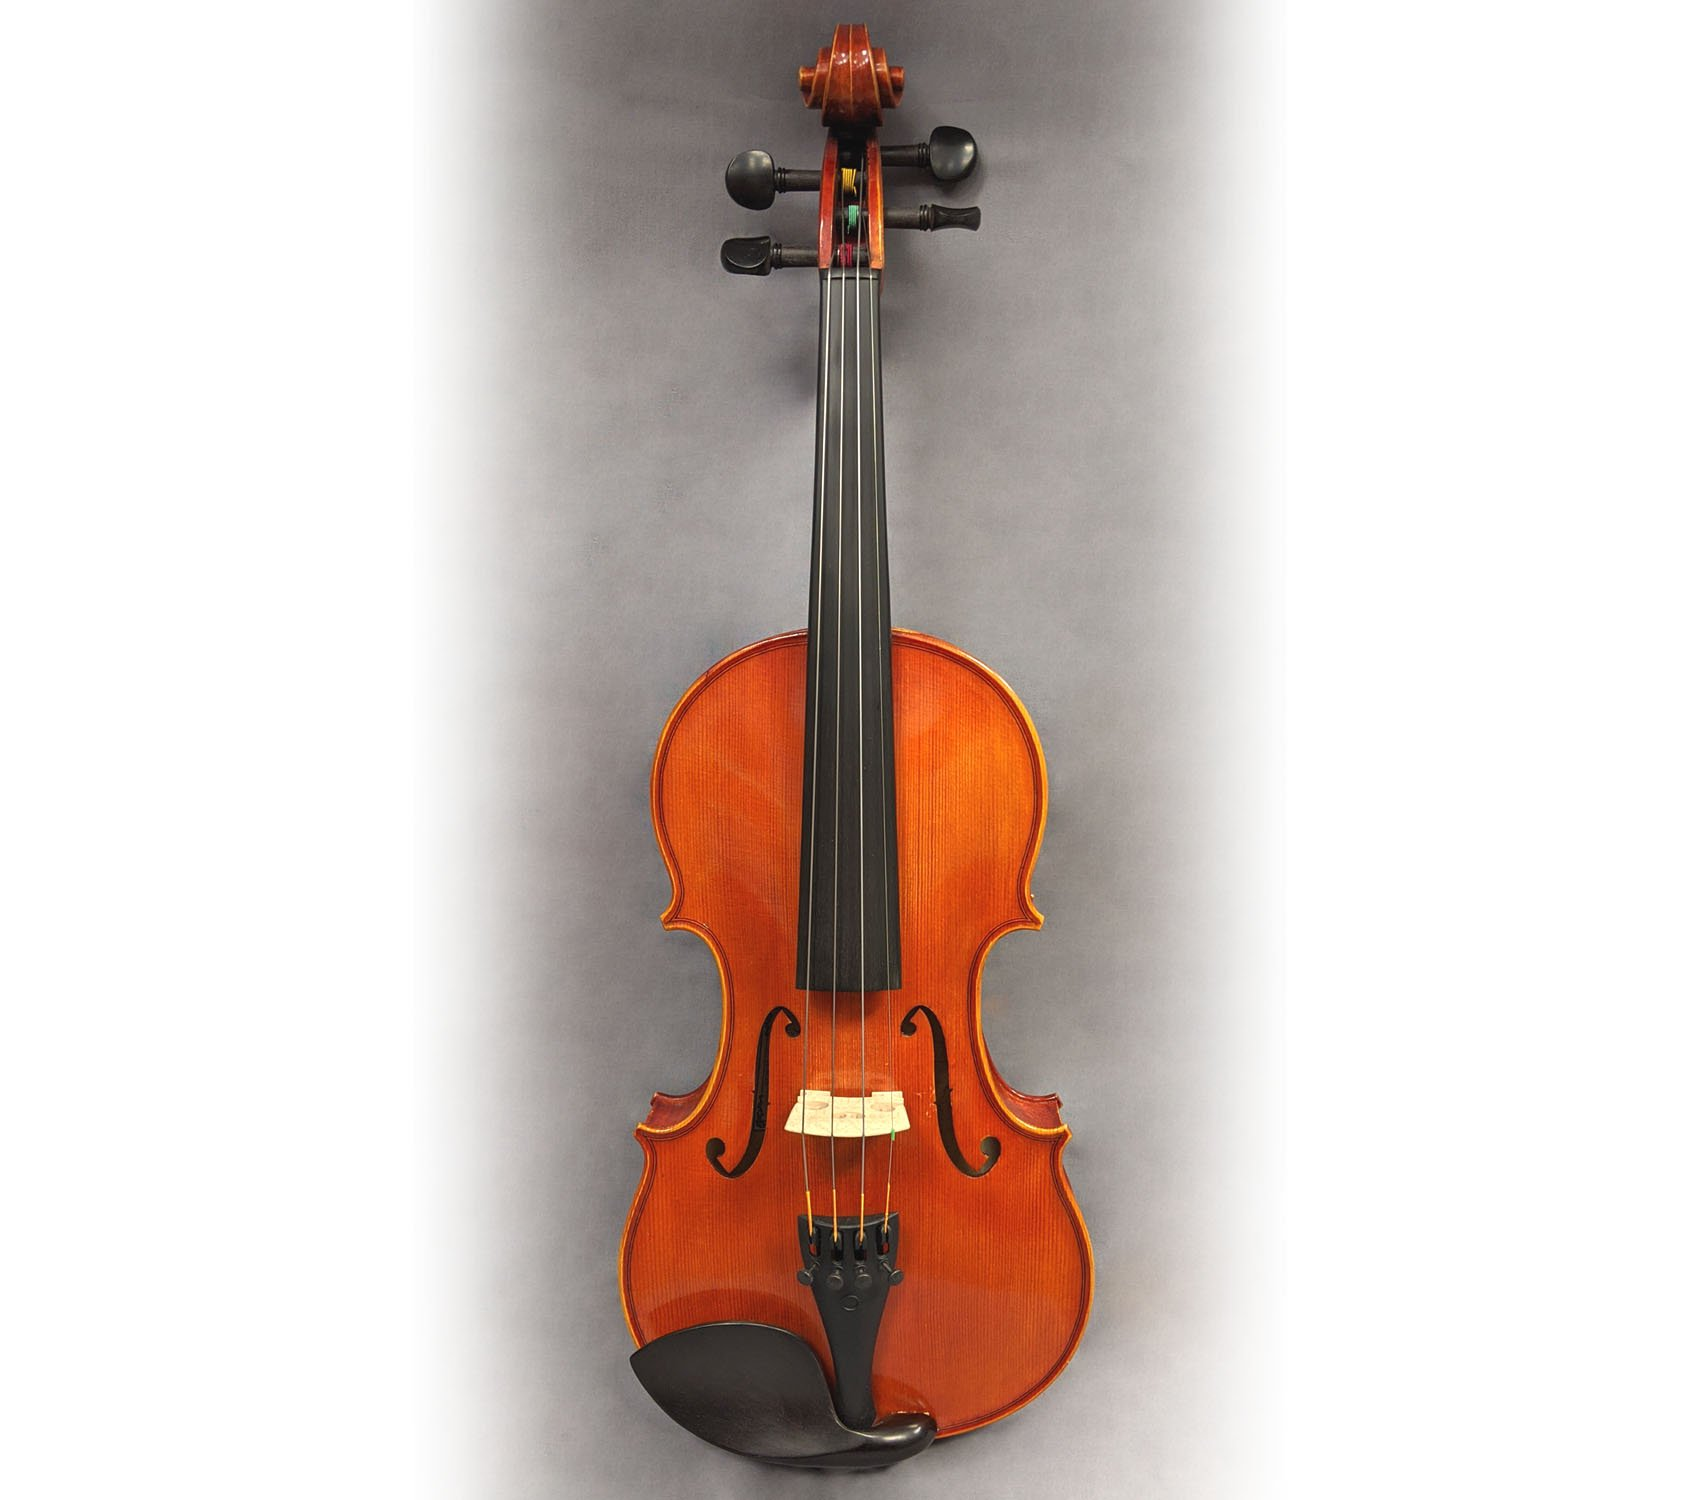 Pavia VN261 4/4 Violin Outfit